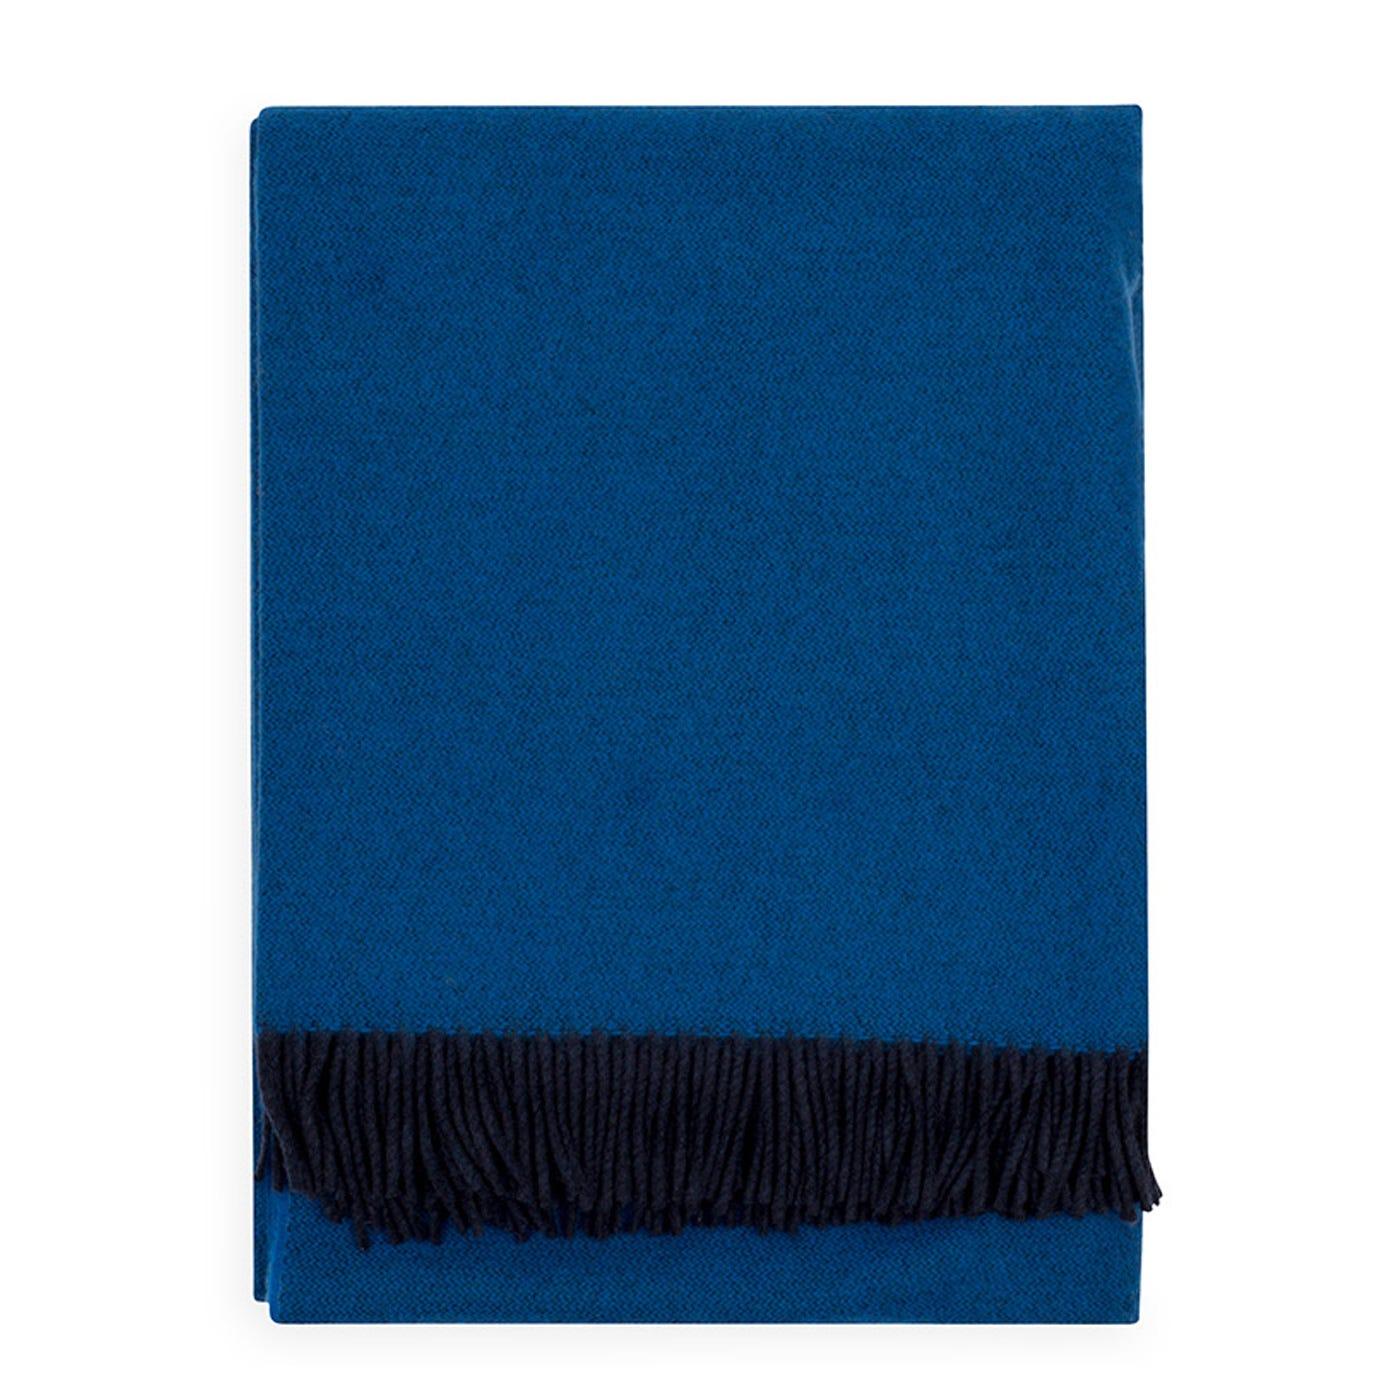 Two Tone Merino Blue